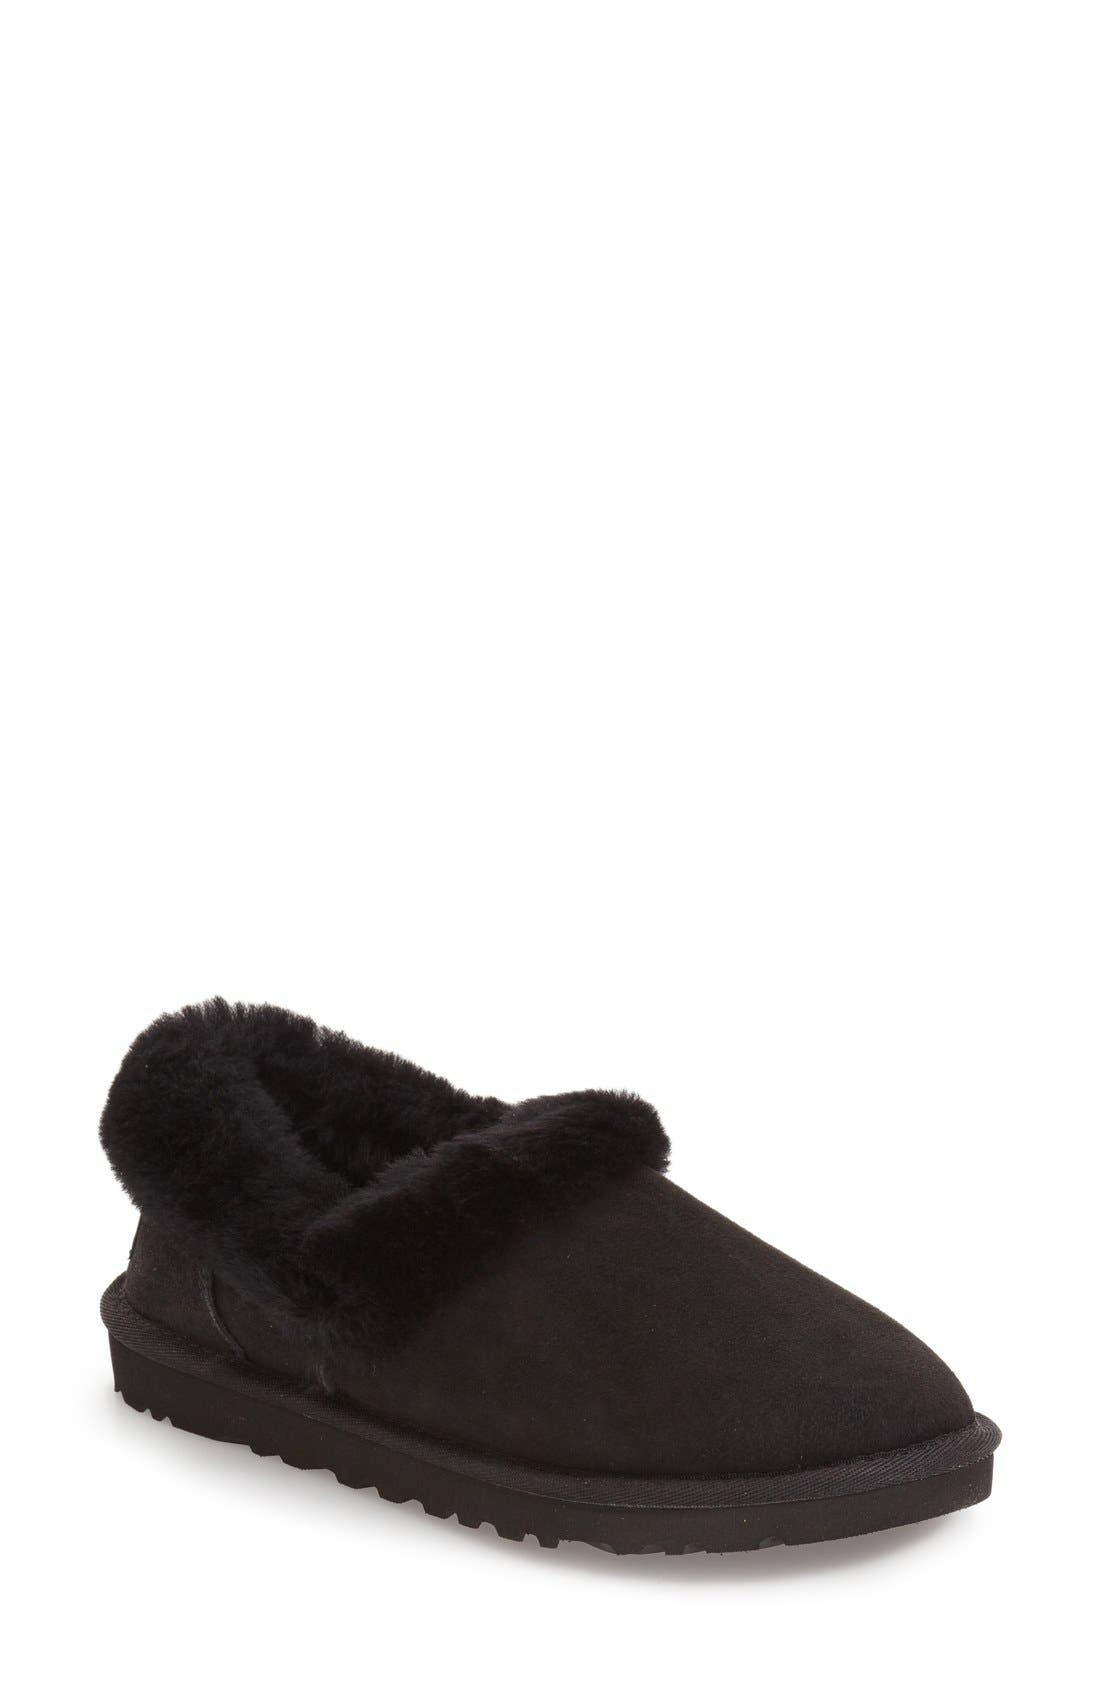 Main Image - UGG® Nita Genuine Shearling Slipper (Women)